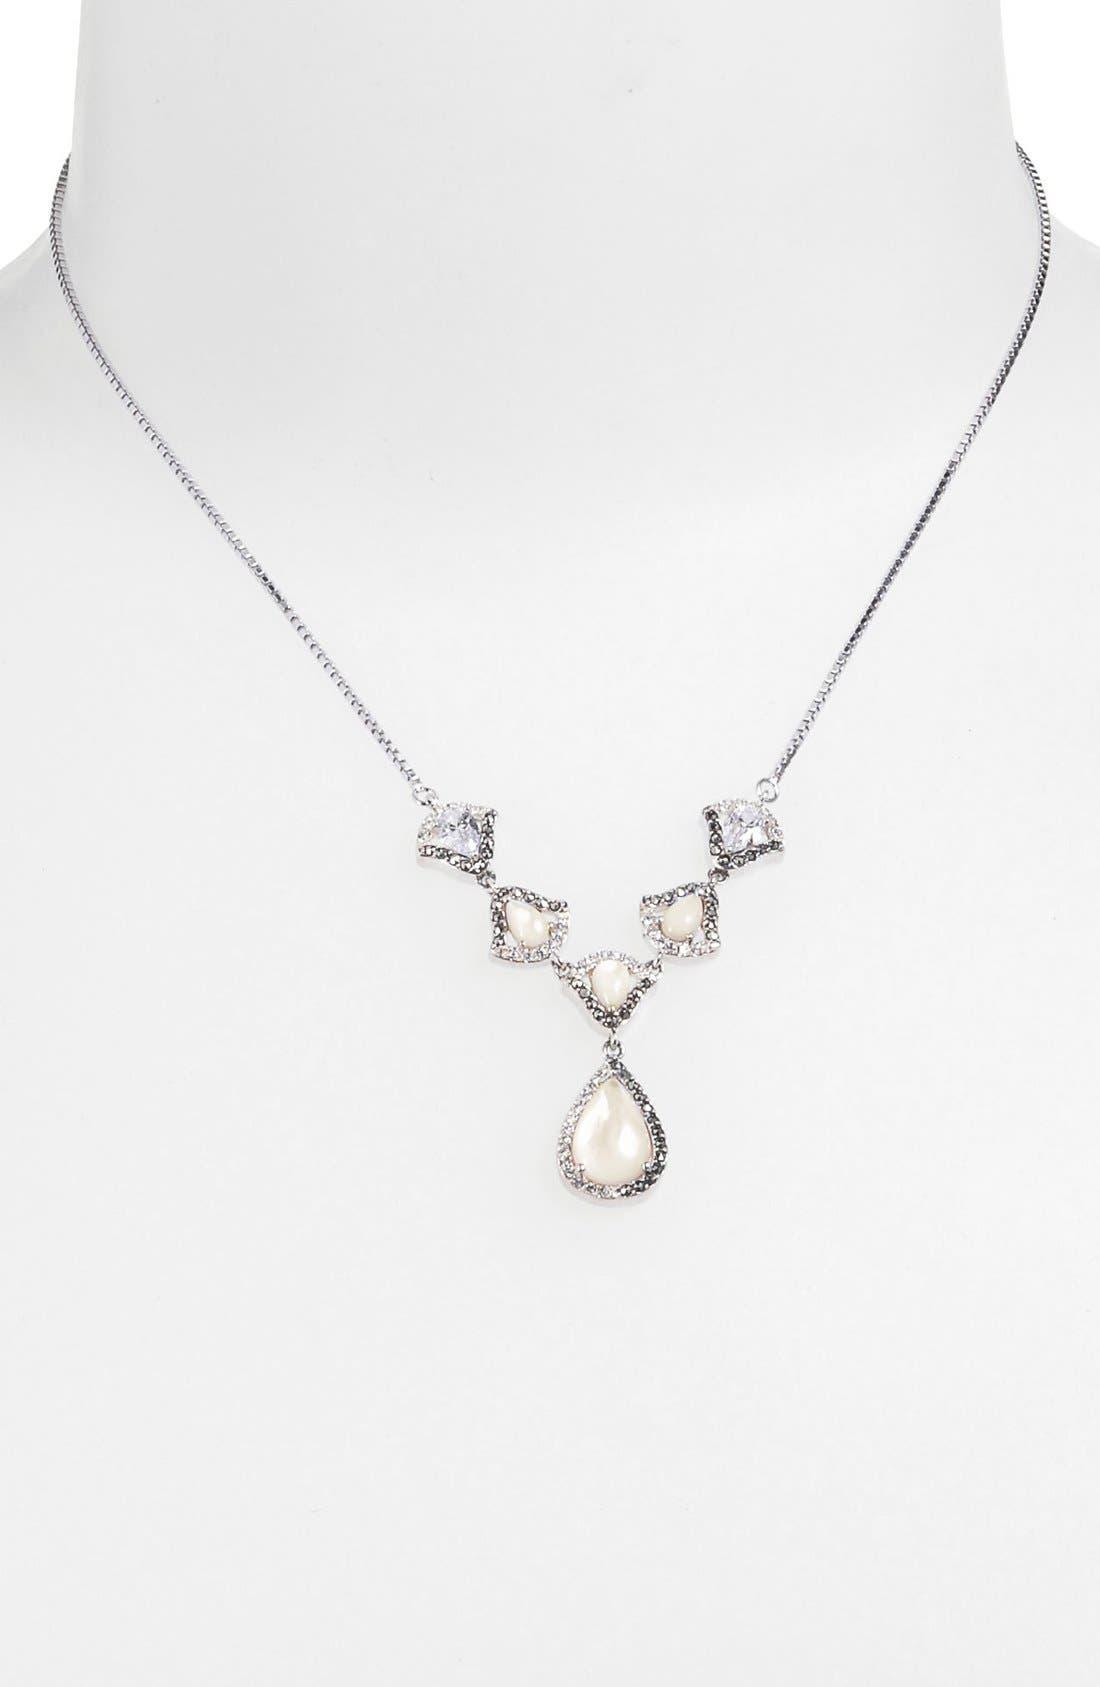 Alternate Image 1 Selected - Judith Jack 'Amore' Pendant Necklace